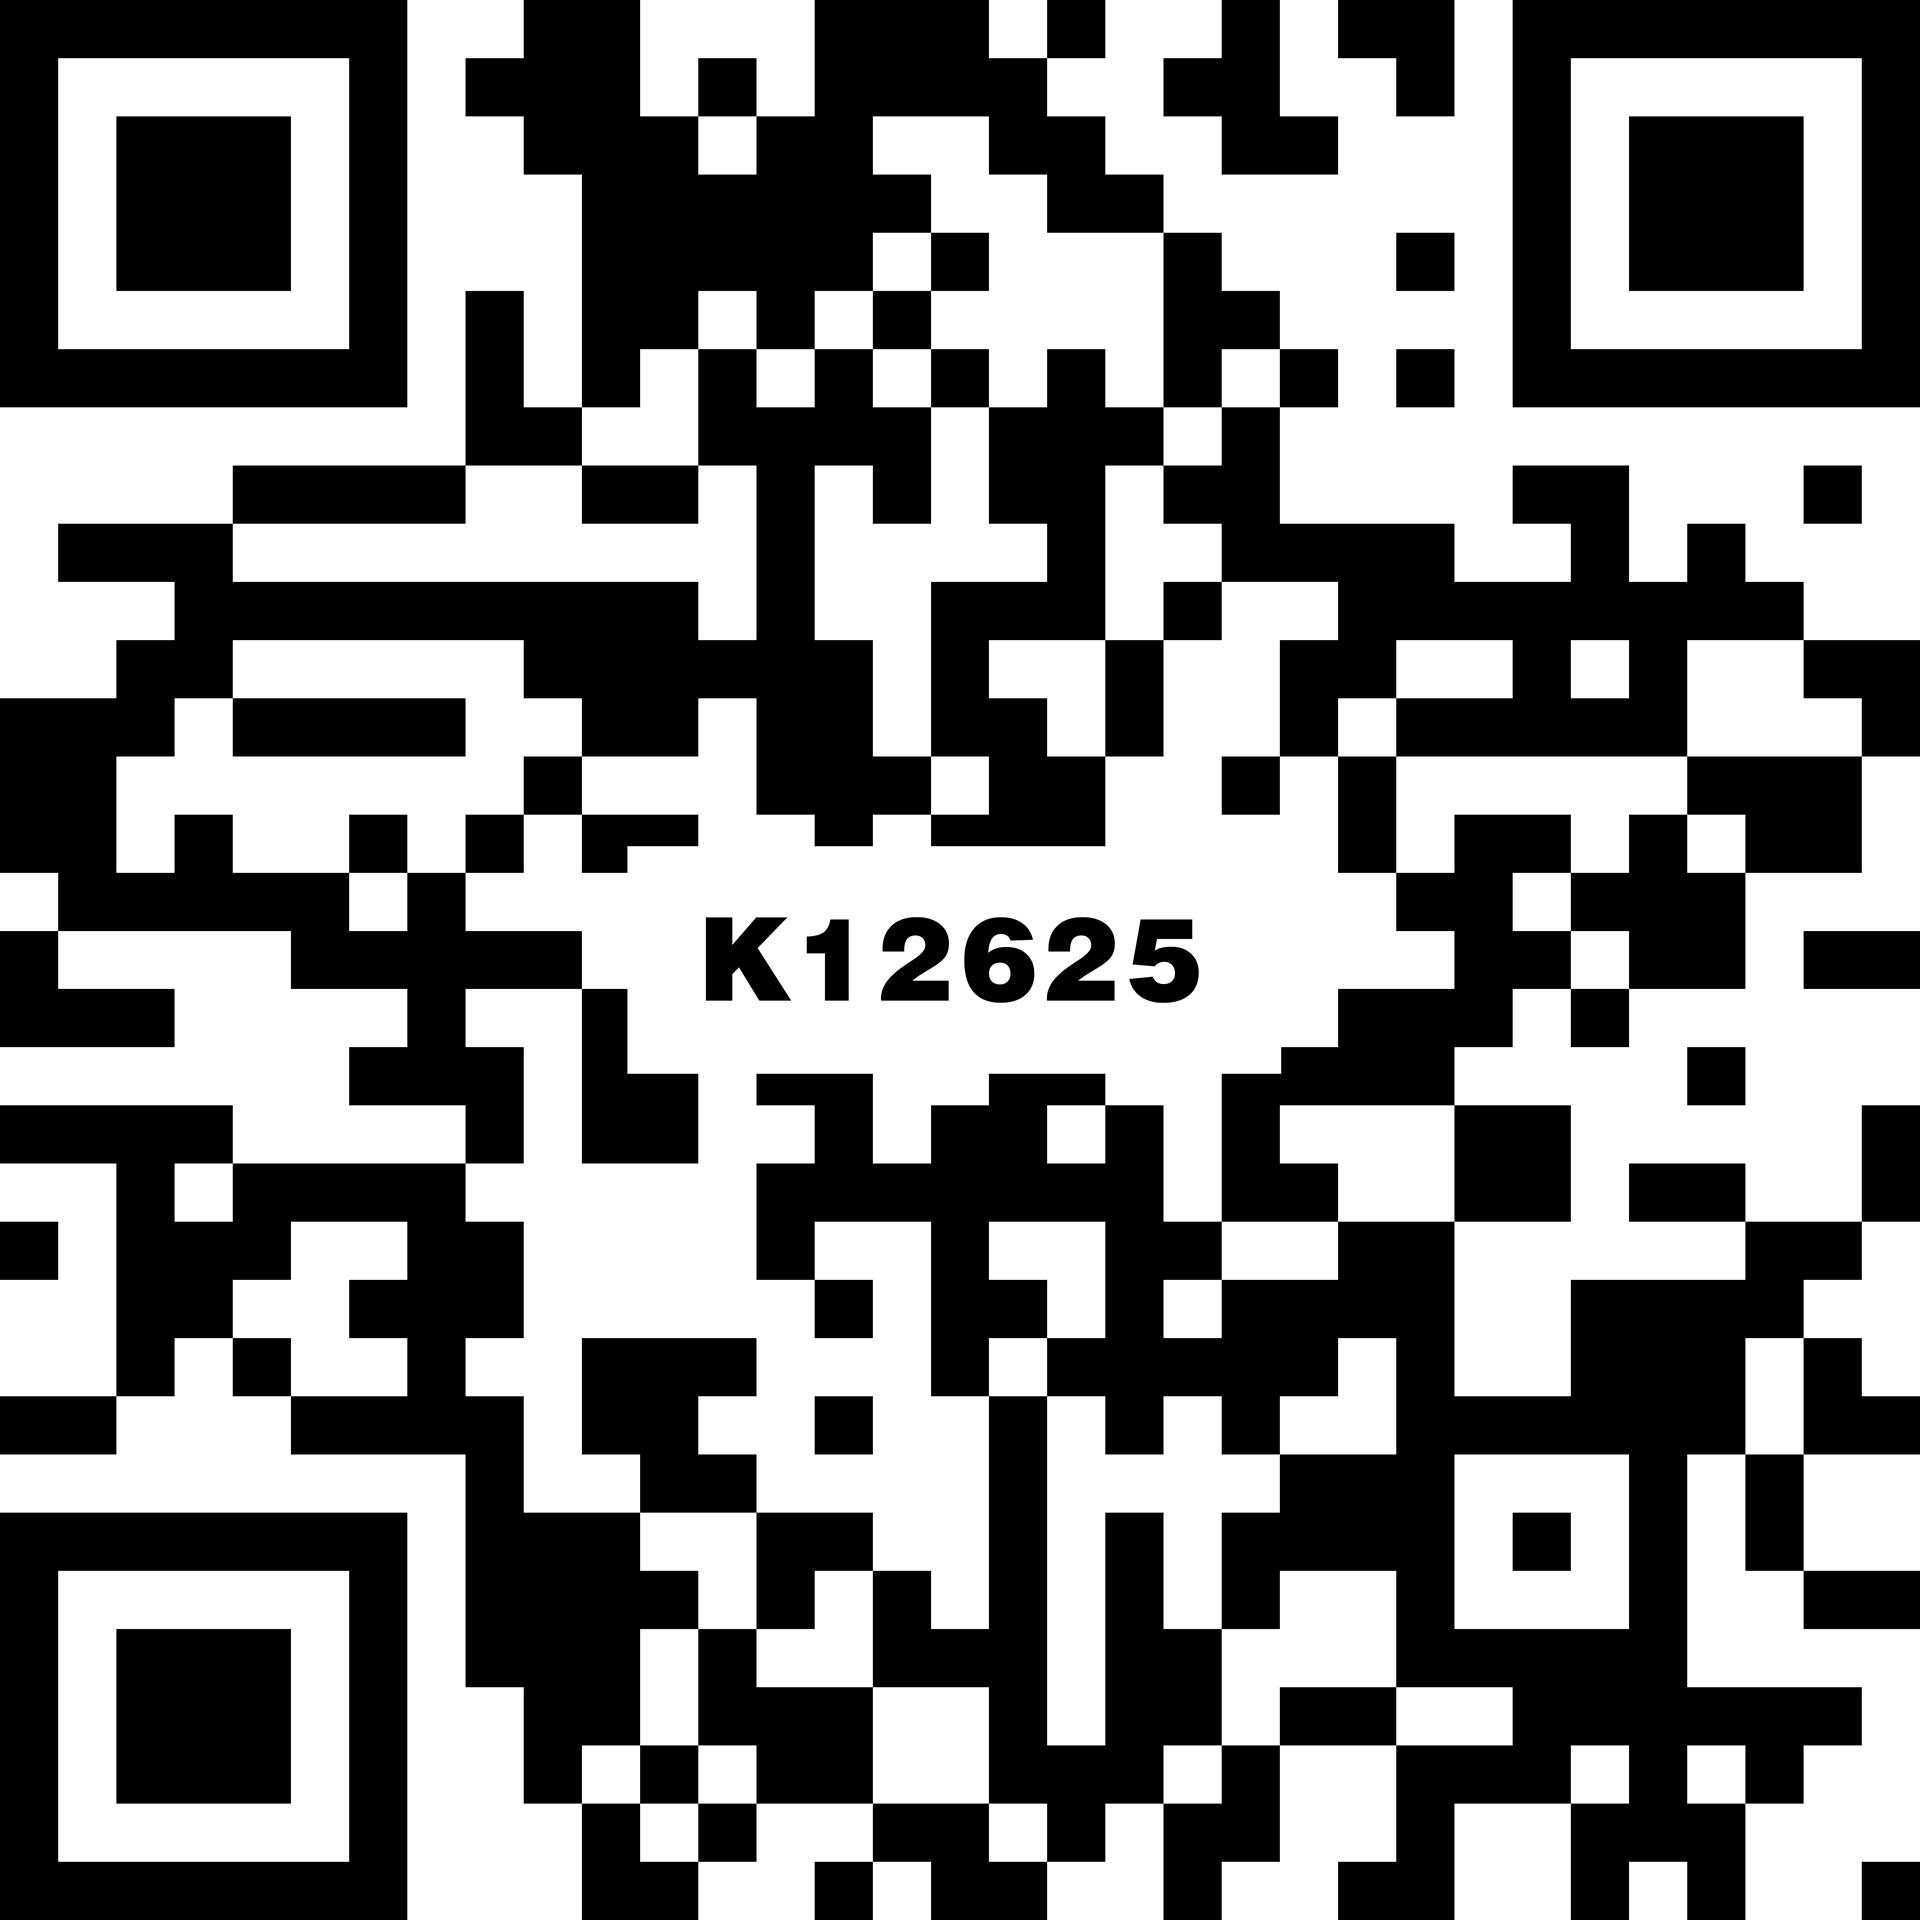 K12625